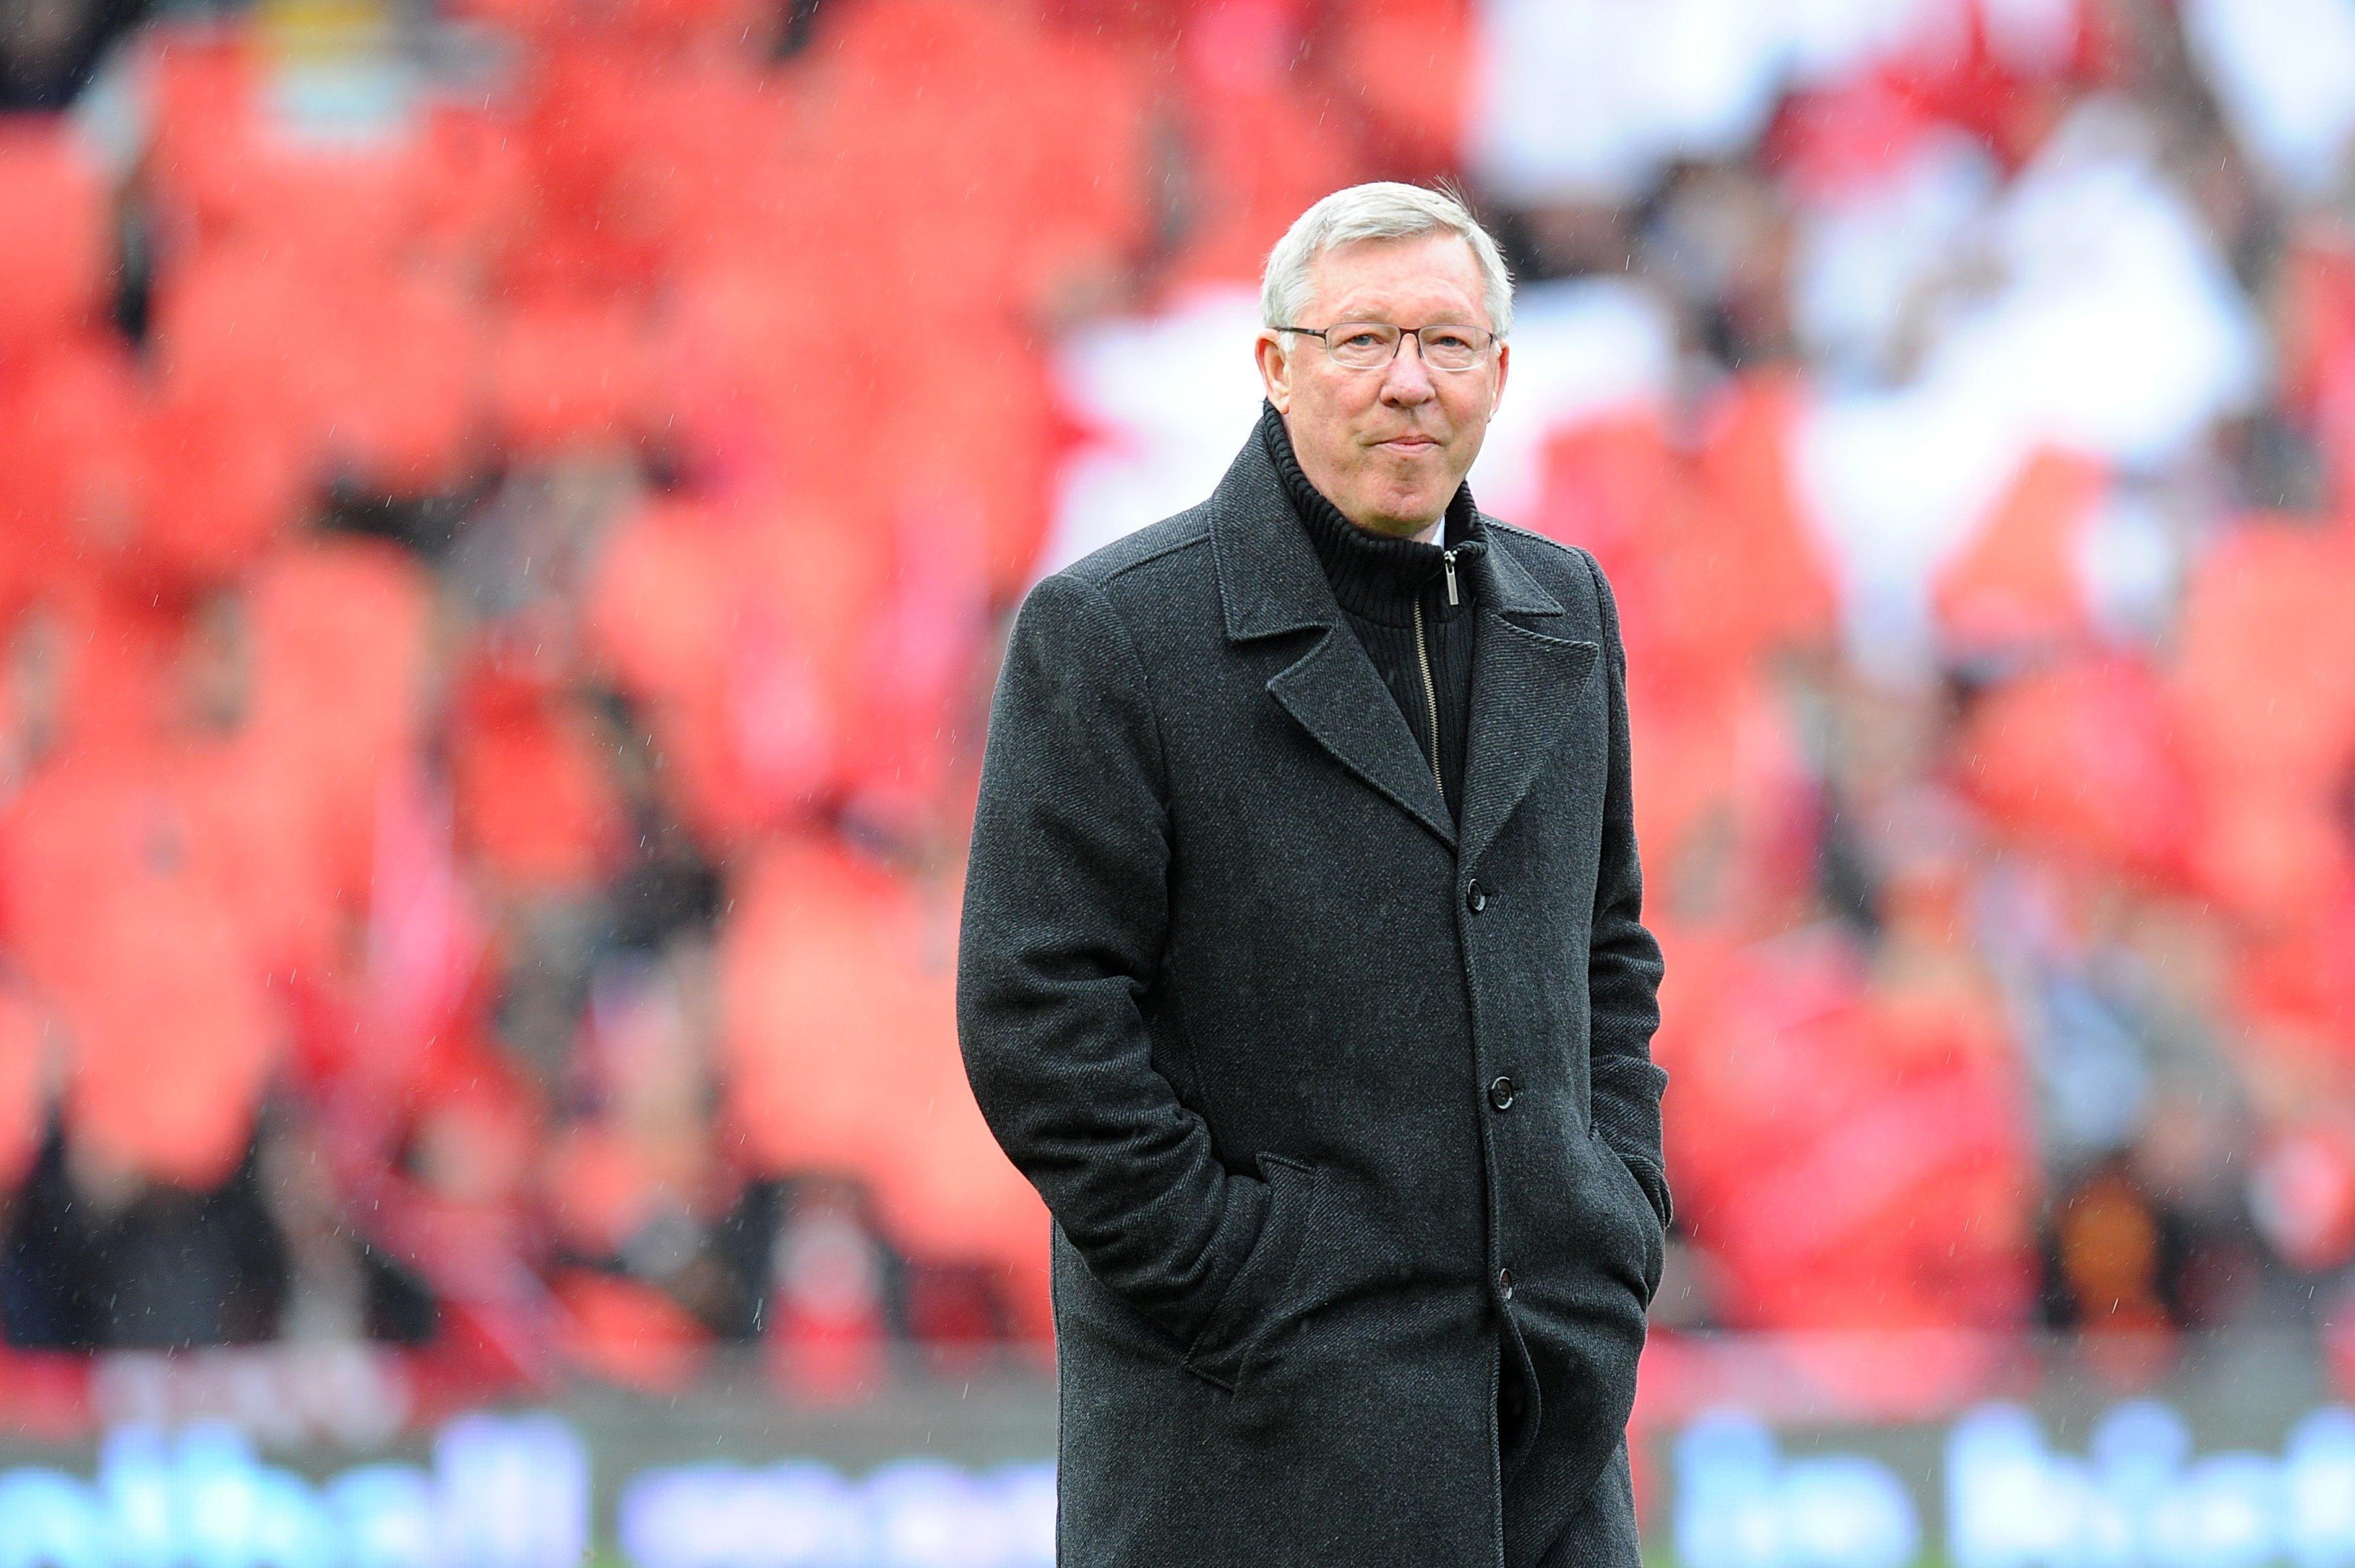 Sir Alex Ferguson Has Suffered A Brain Haemorrhage